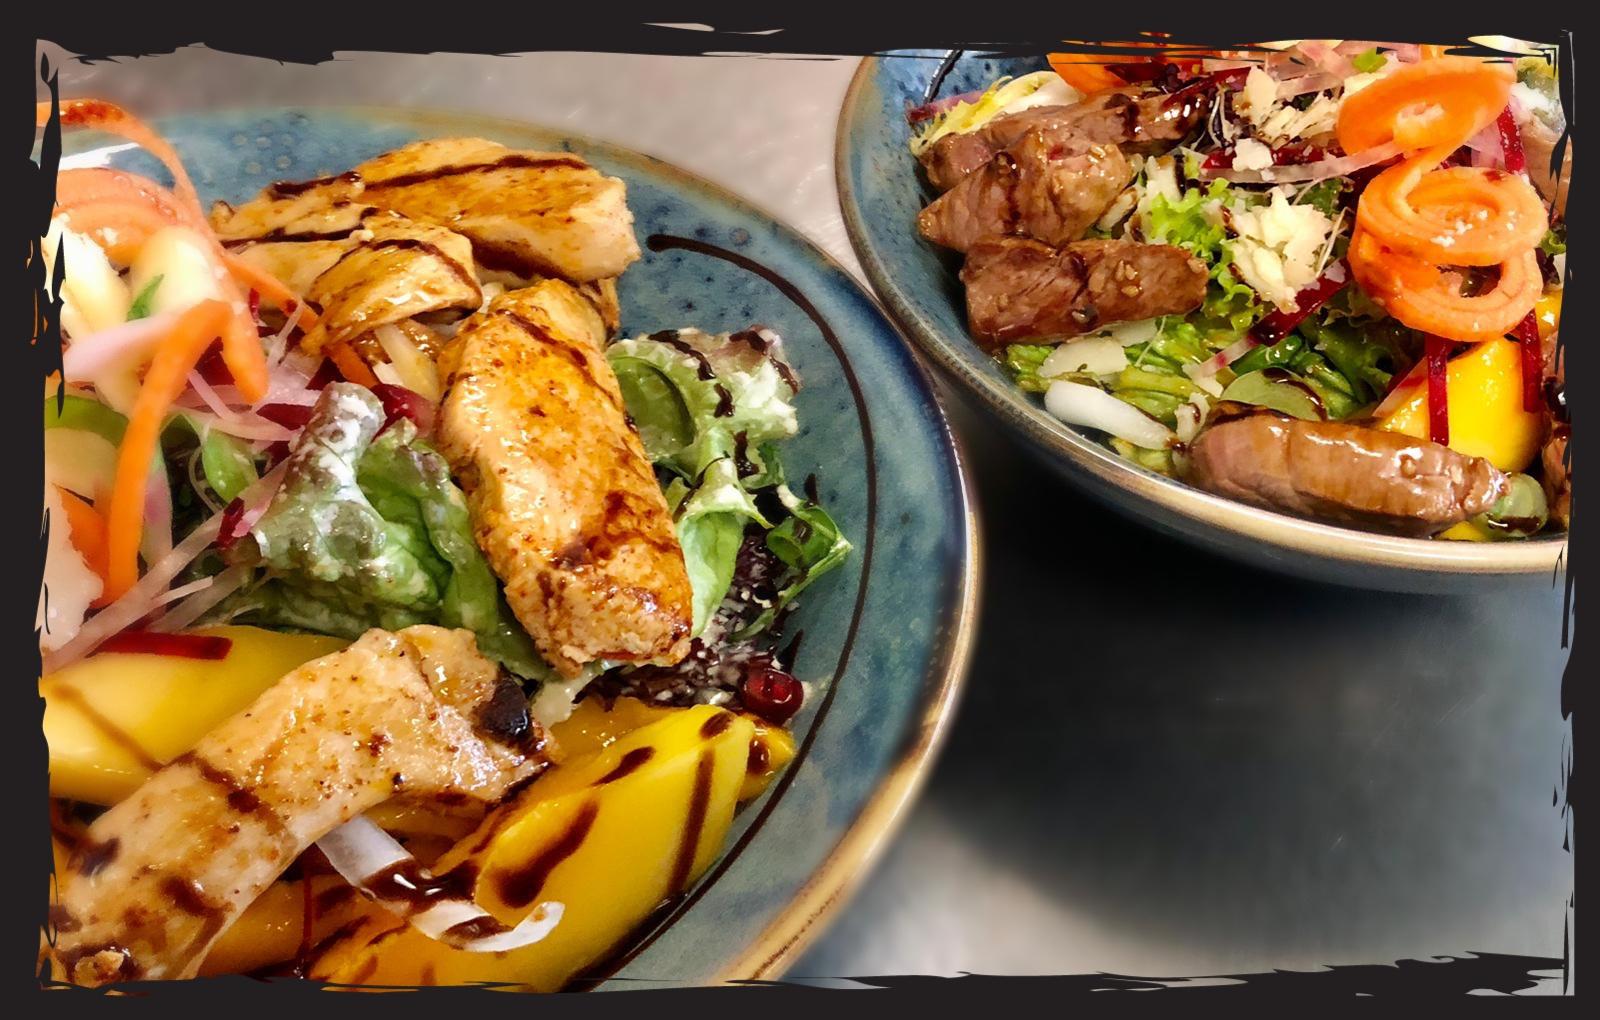 Salatbowle Restaurant Kupferkessel Hitzkirch Seetal